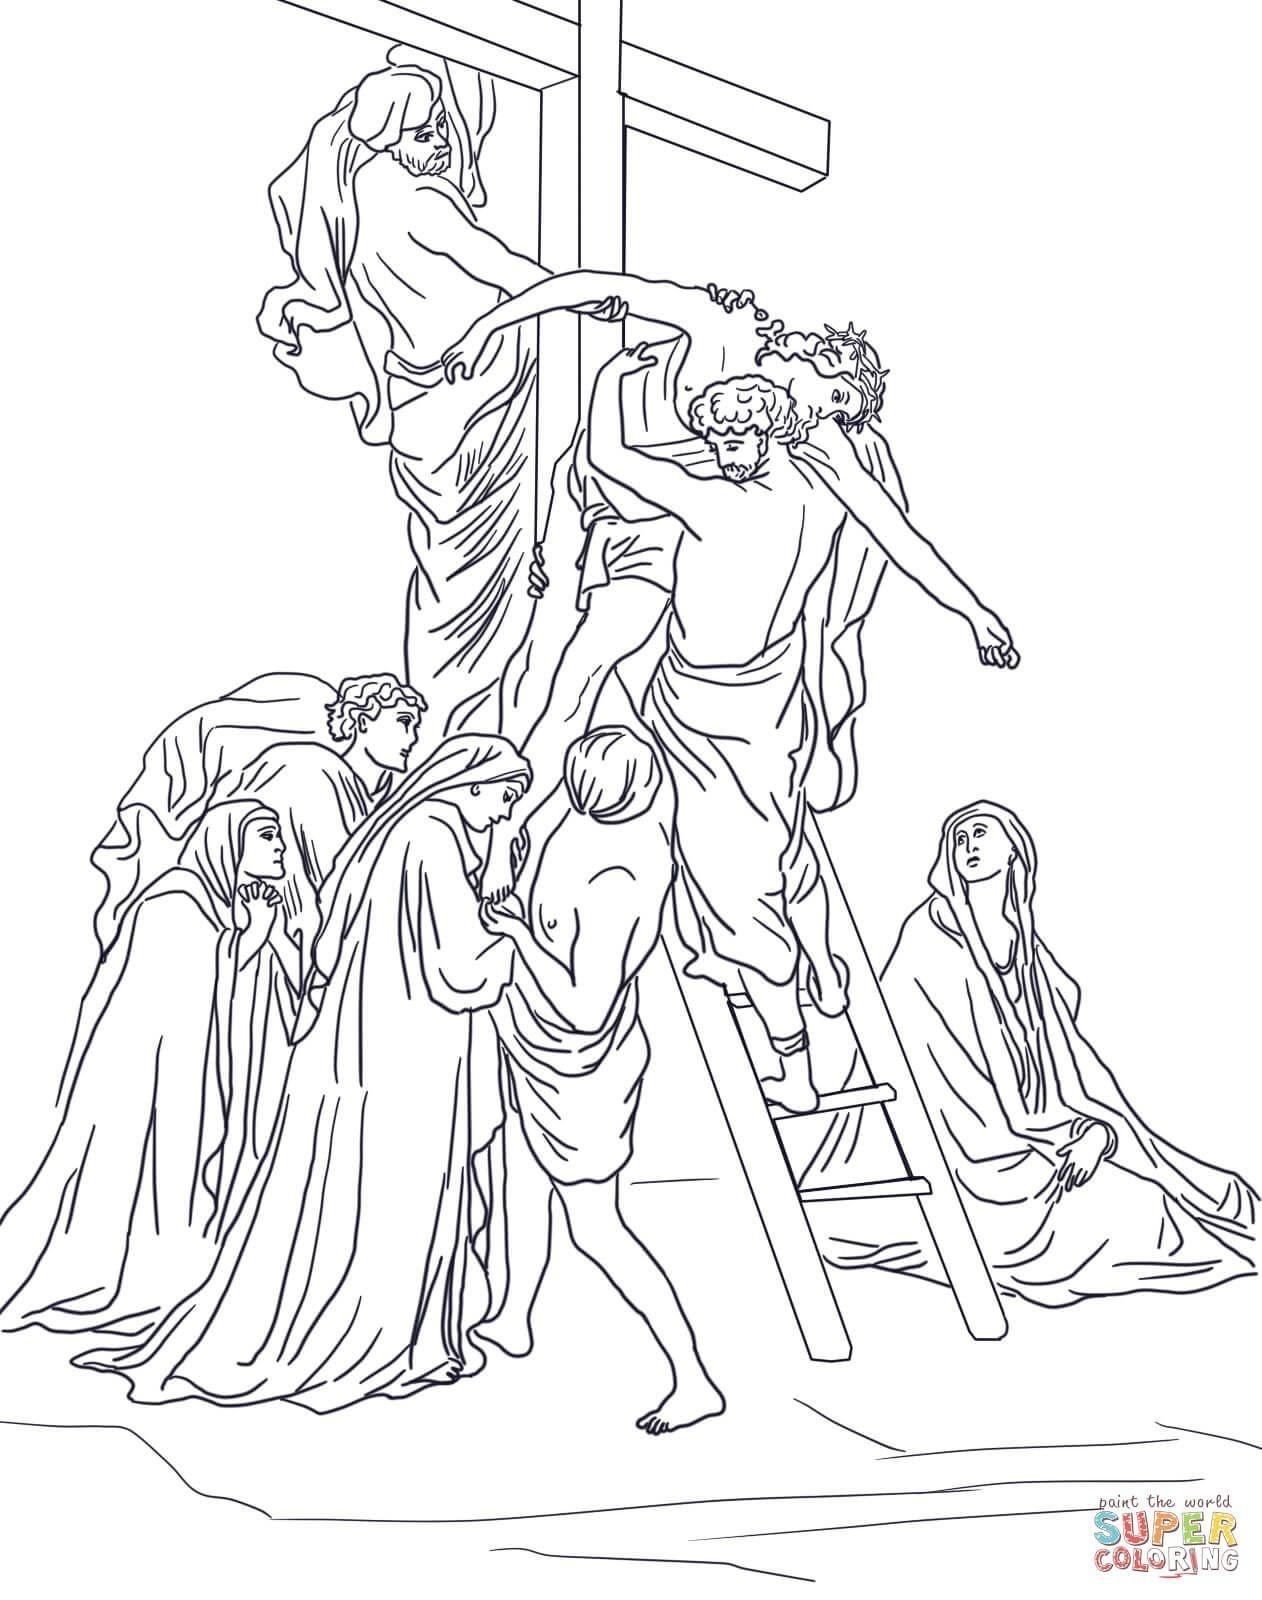 Jesus Stationen Des Kreuzes Ausmalbilder #ausmalbilder #jesus - Free Printable Good Friday Coloring Pages